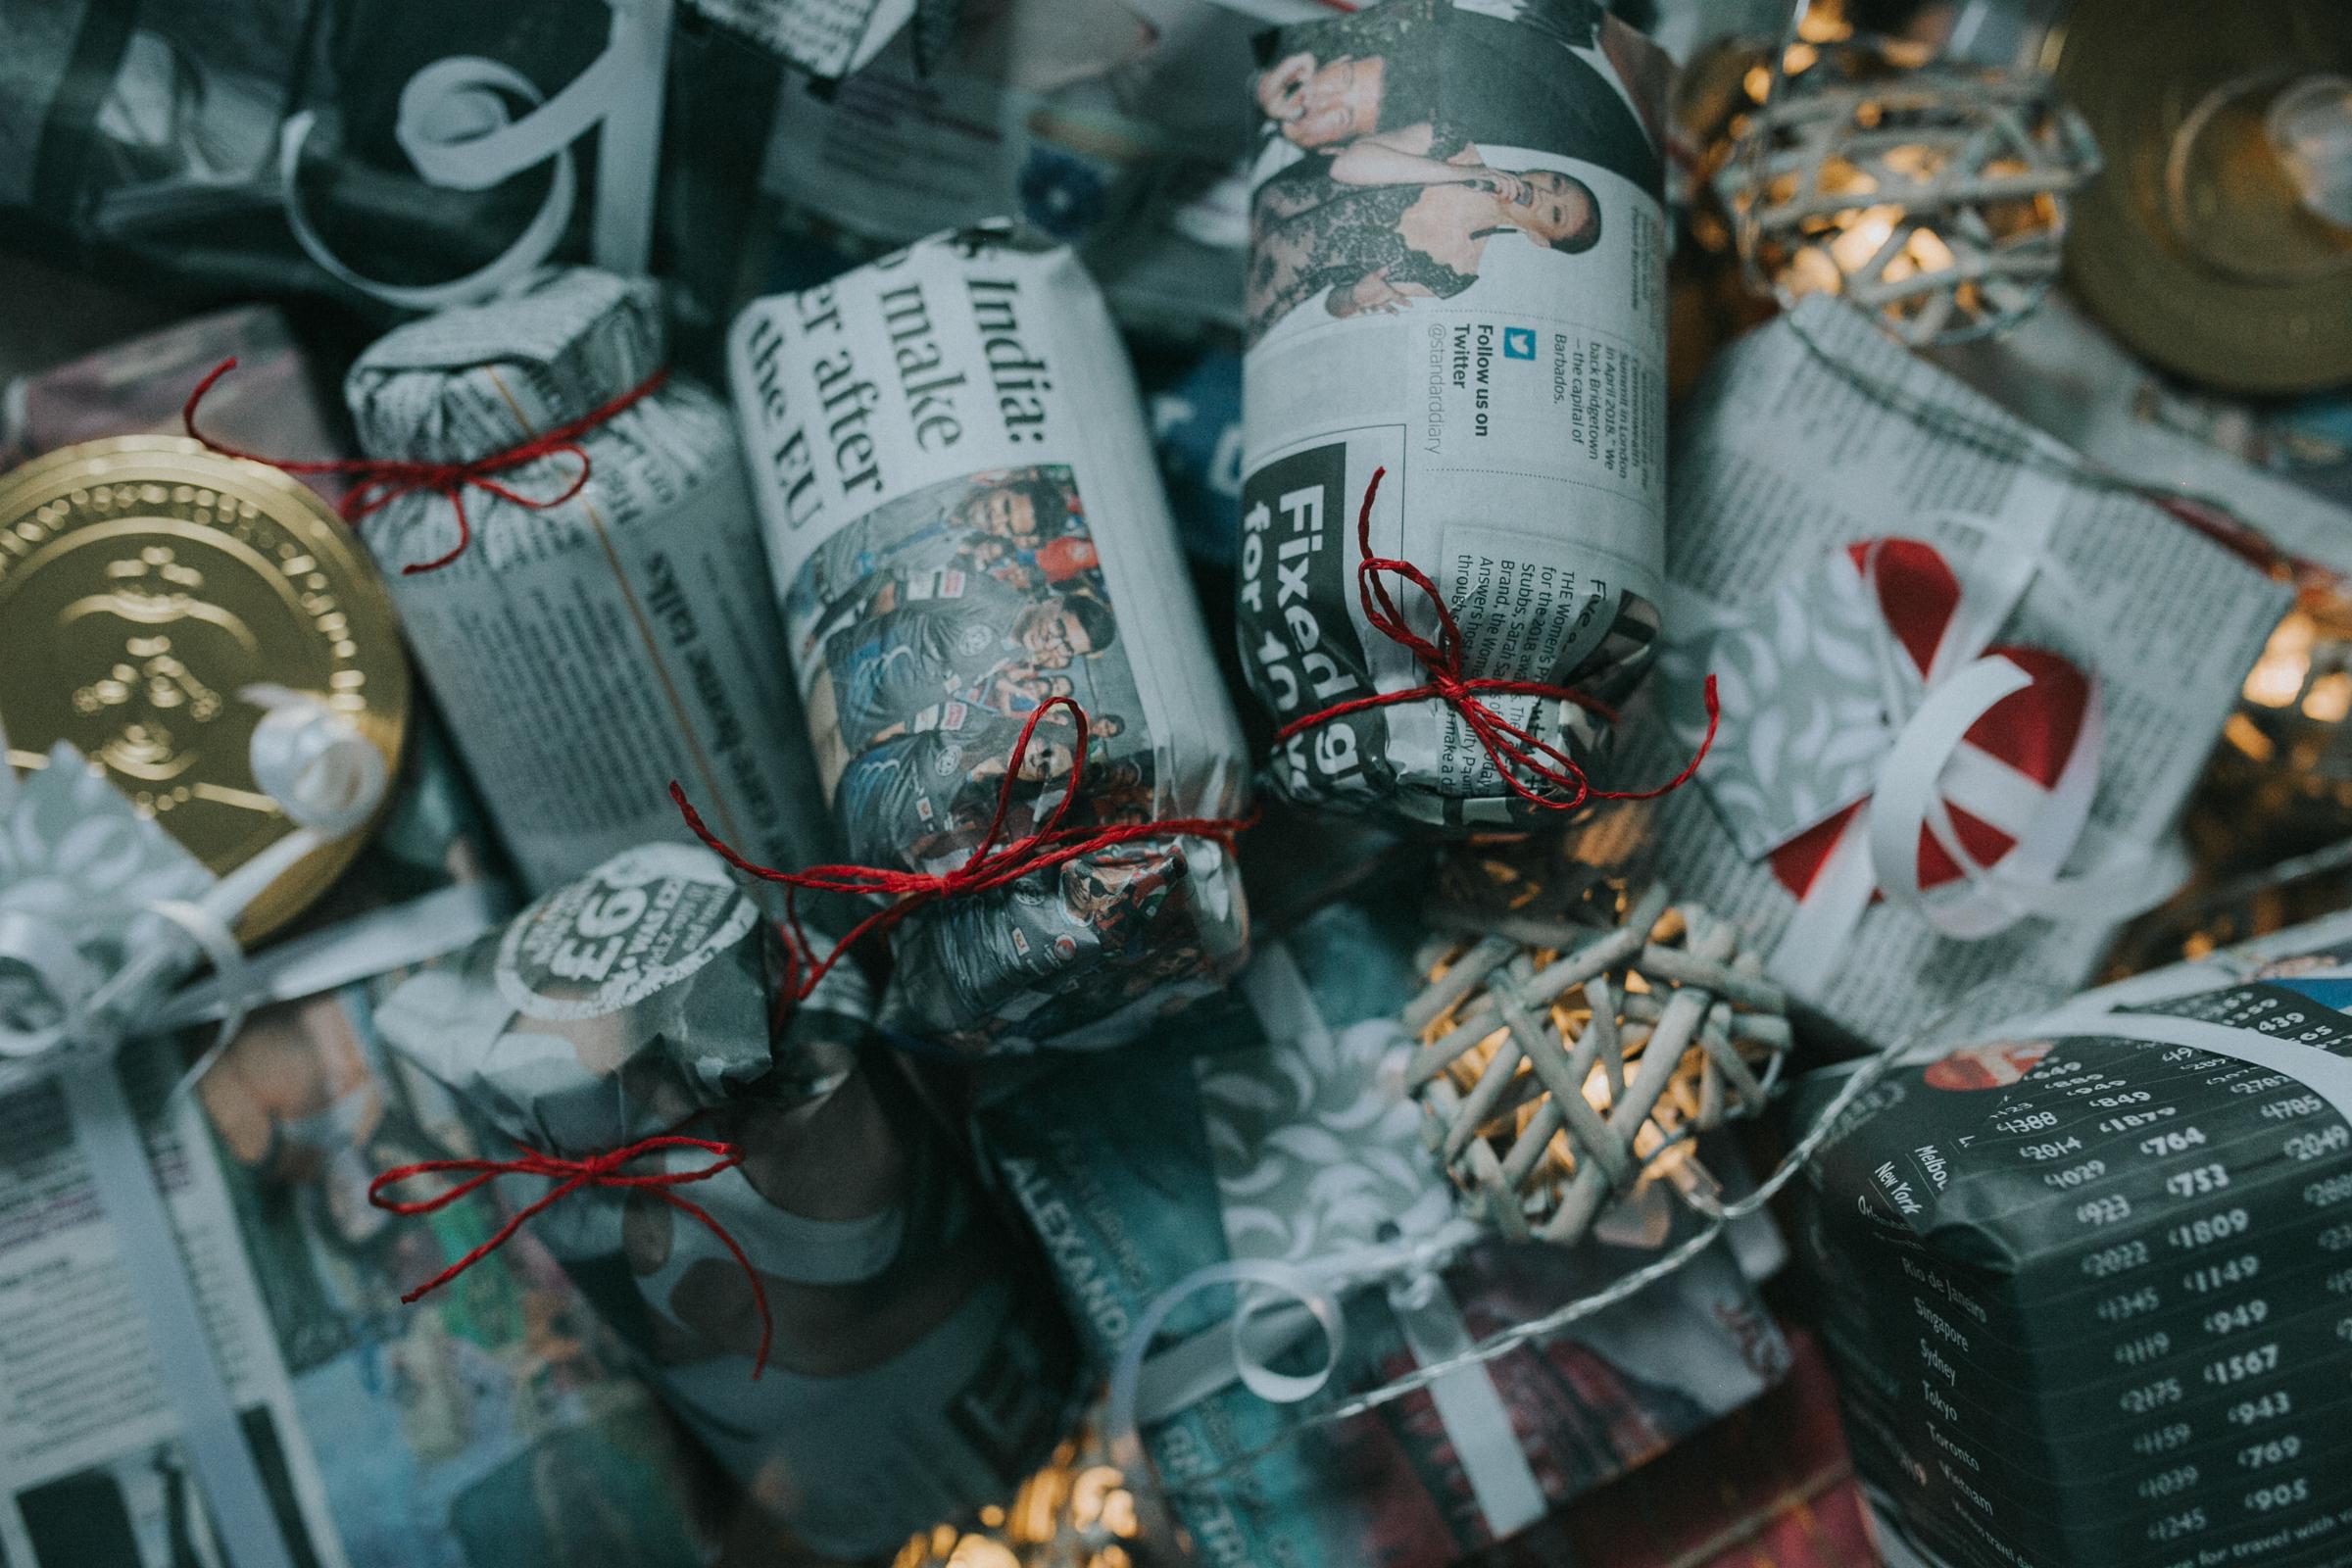 Christmas-gift-wrapping-ideas-minas-planet-minasplanet-how-to-wrap-christmas-presents-diy2.jpg